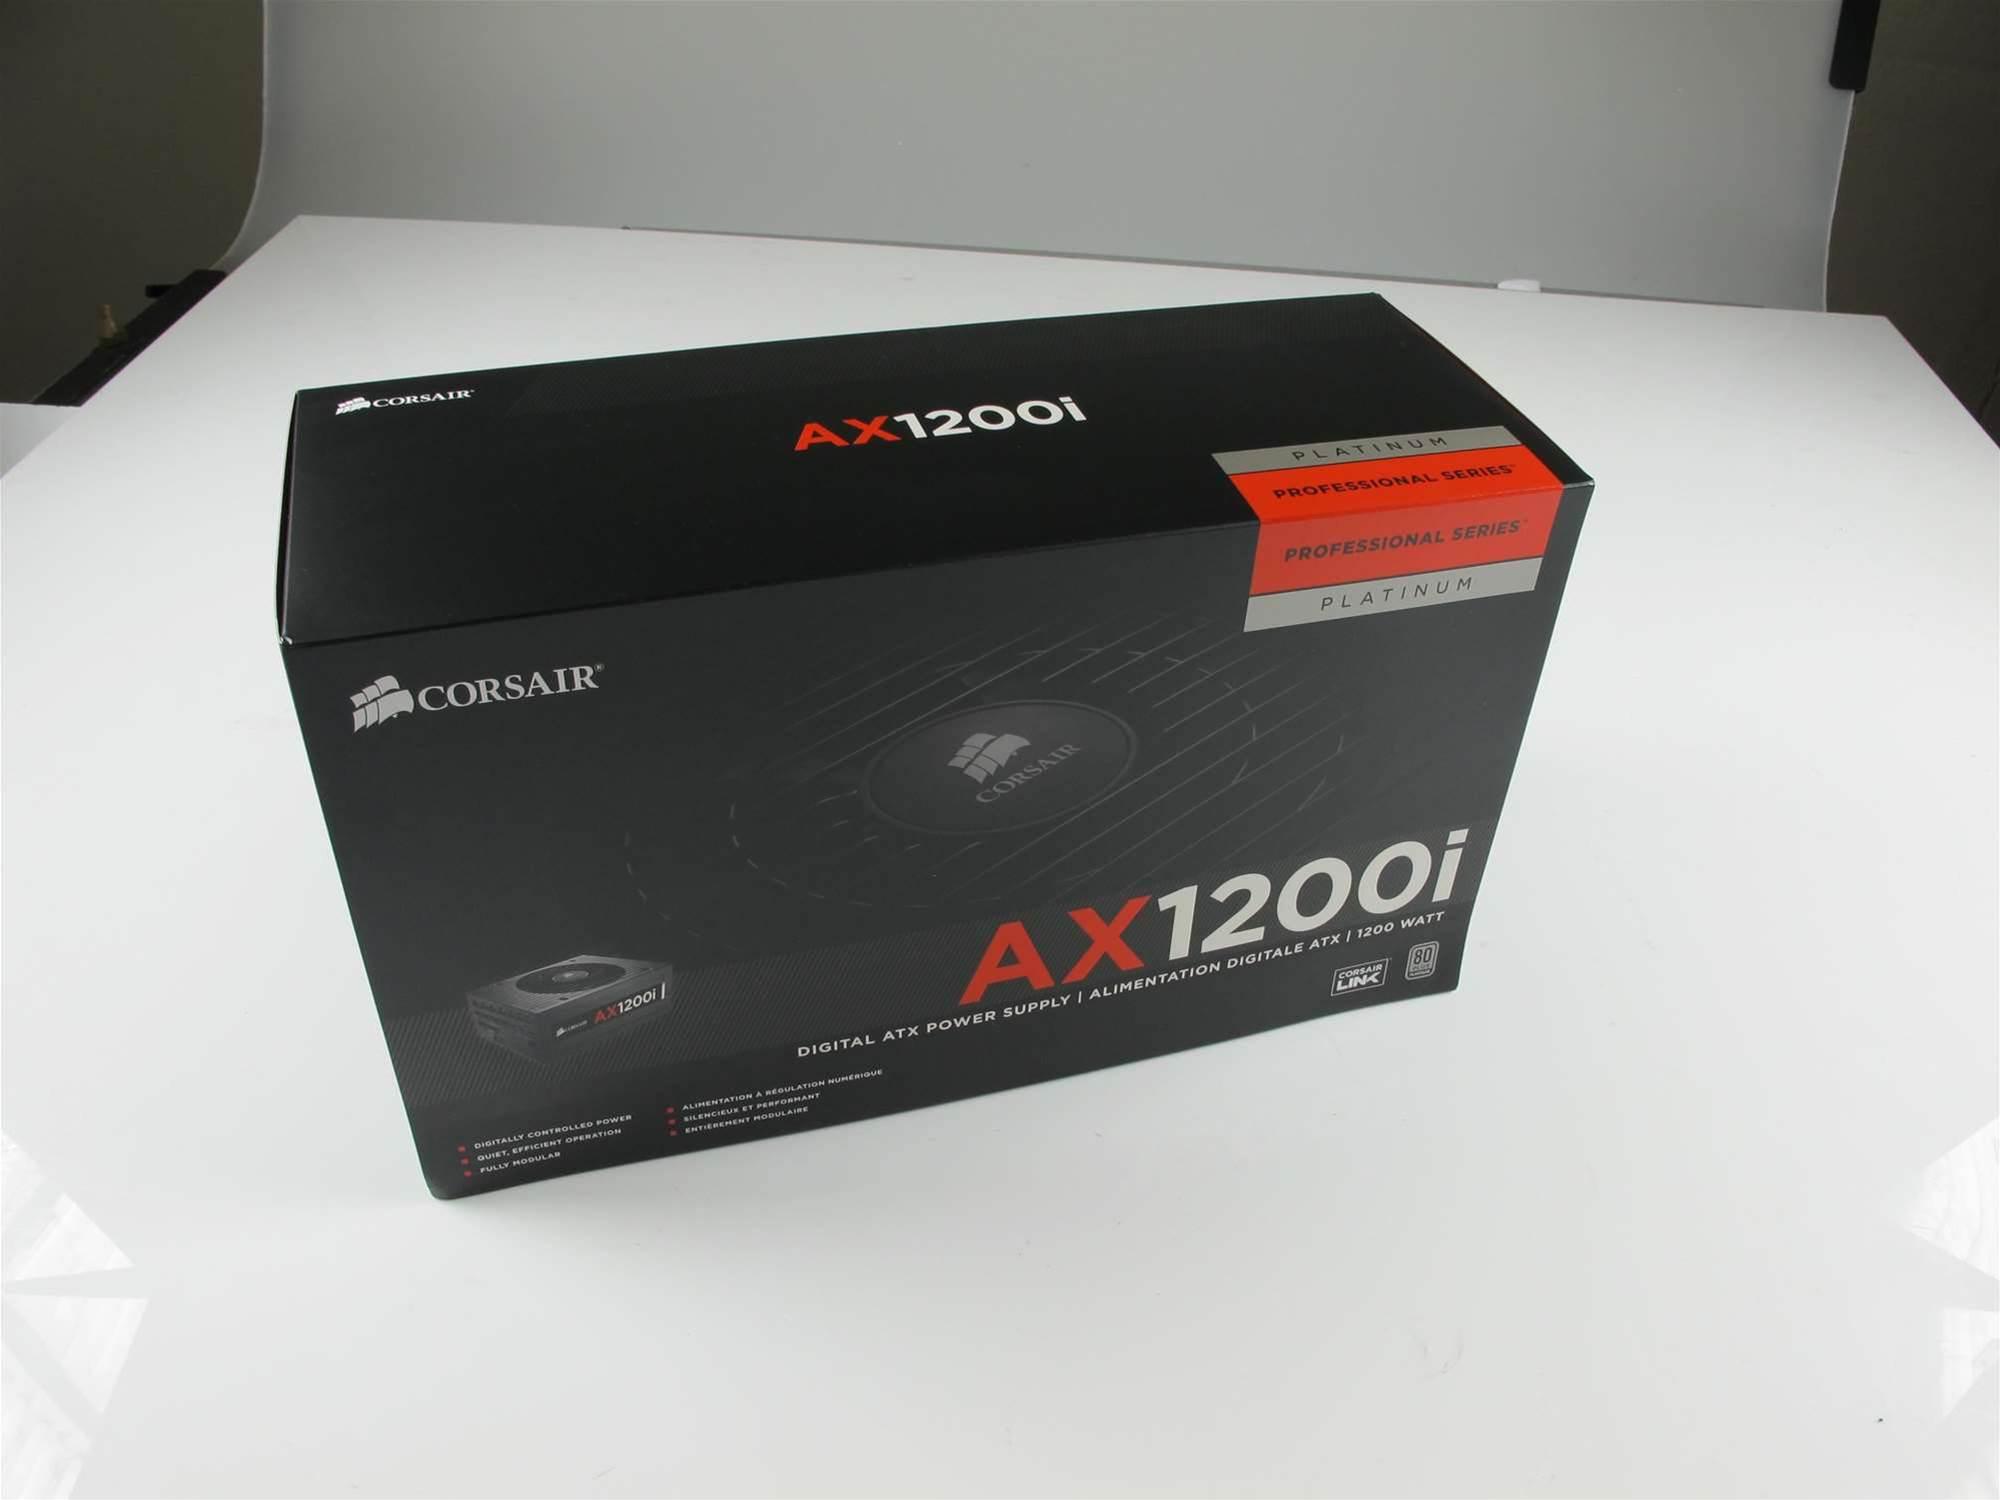 Corsair AX1200i PSU Gallery